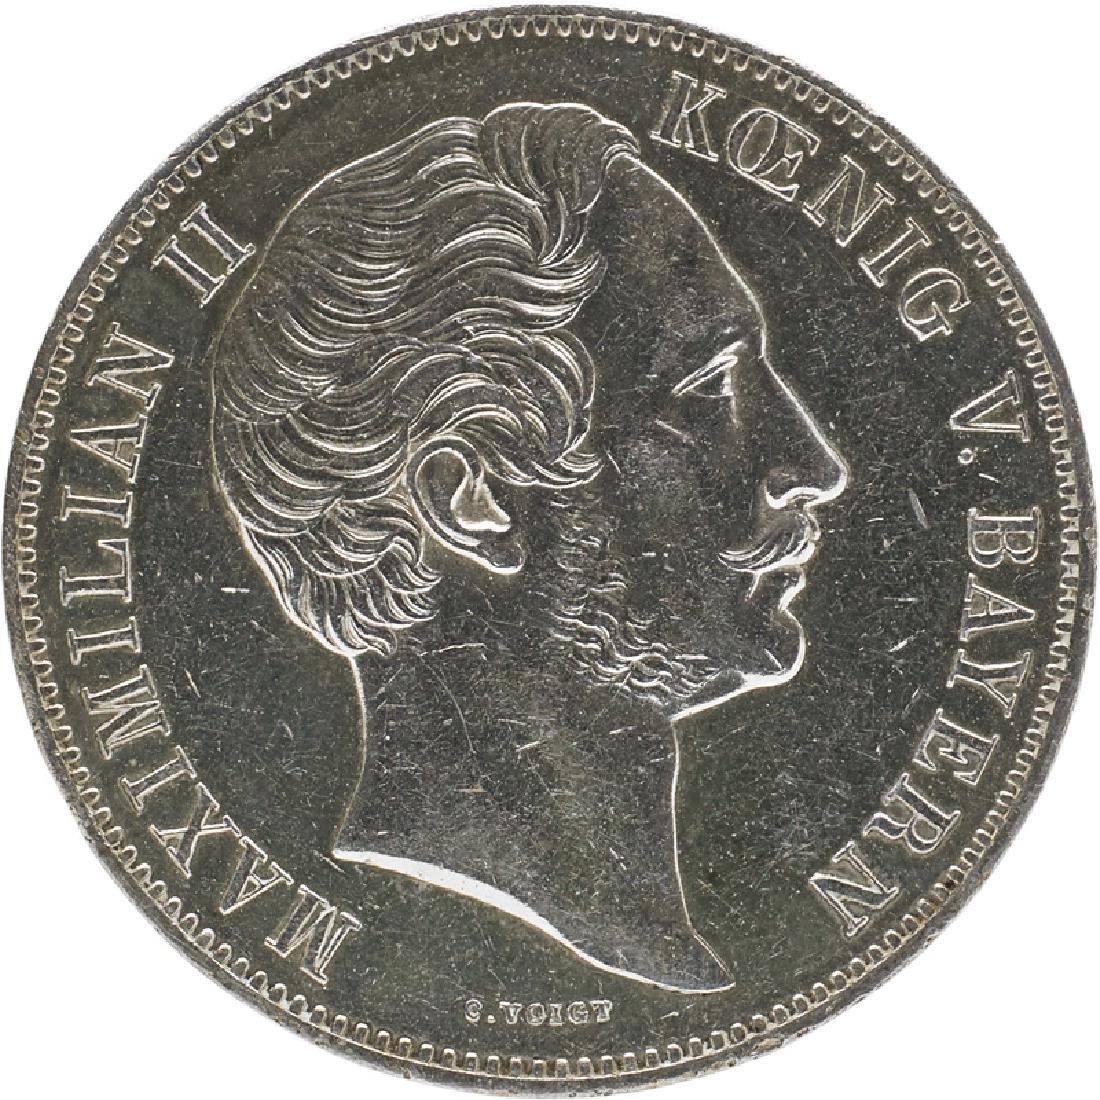 GERMAN SILVER COINS